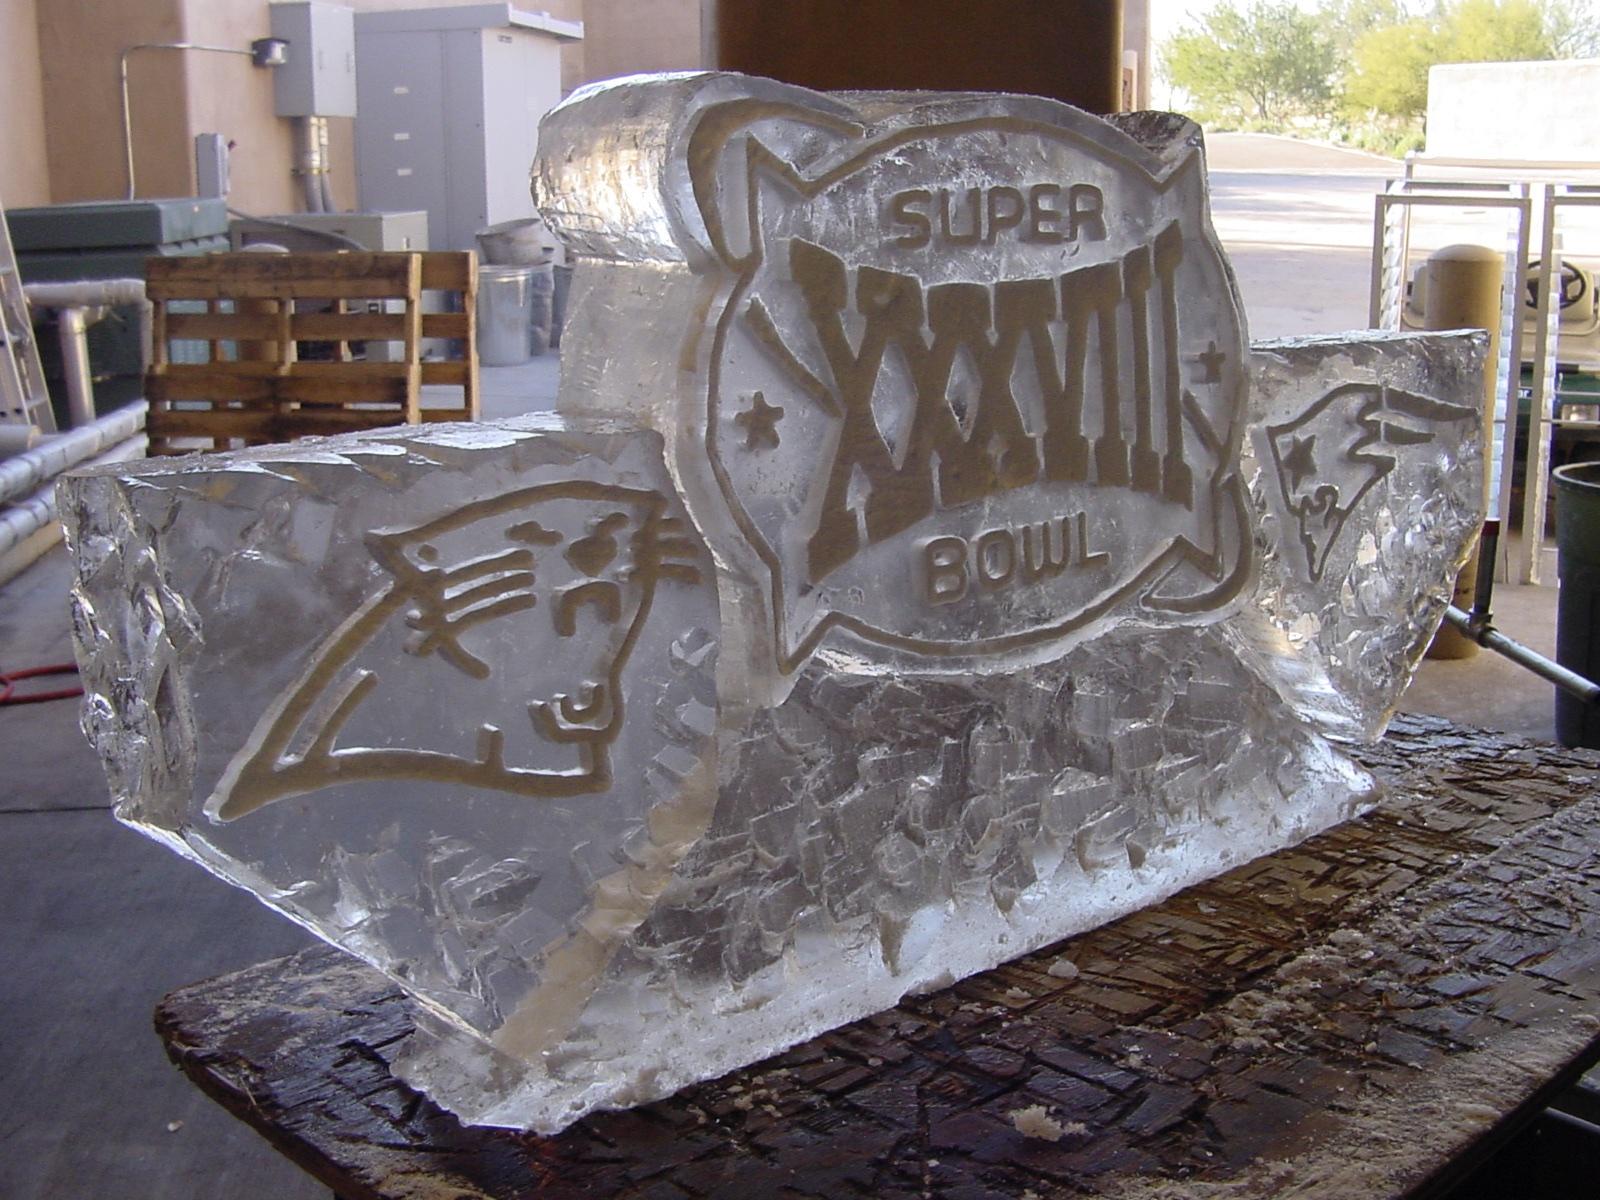 2-1-04 Super Bowl 5.jpg